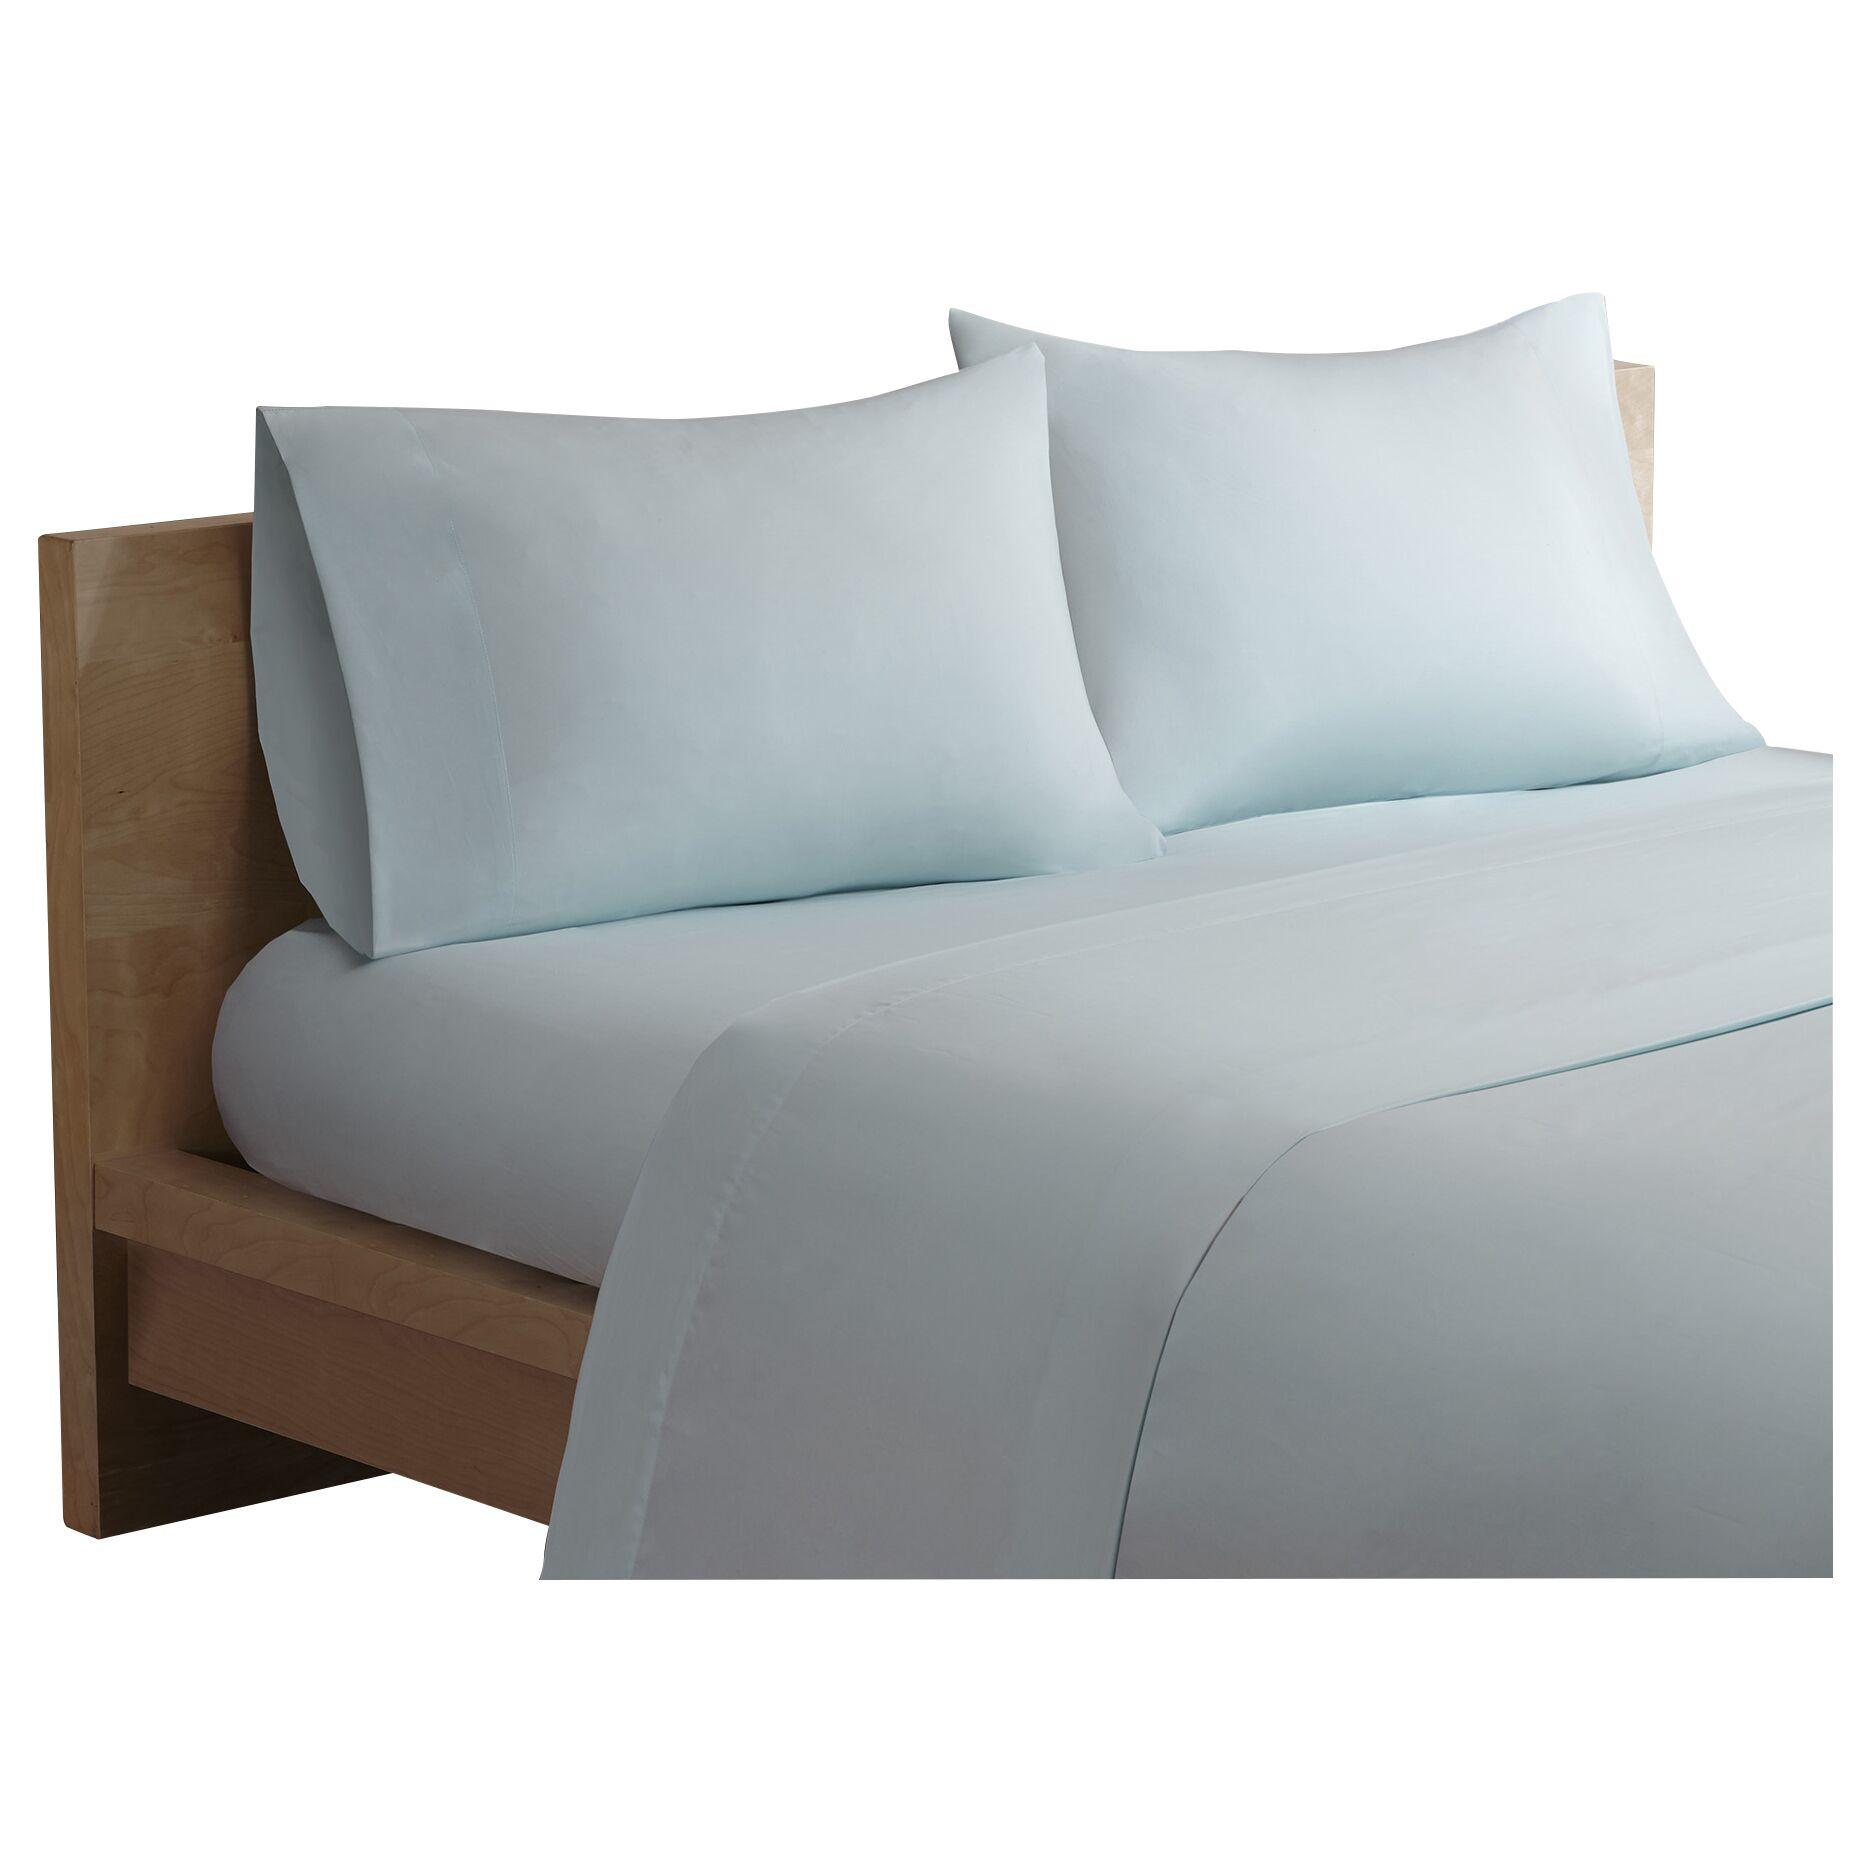 Bridget Forever Percale 200 Thread Count Cotton Sheet Set Size: California King, Color: Seafoam